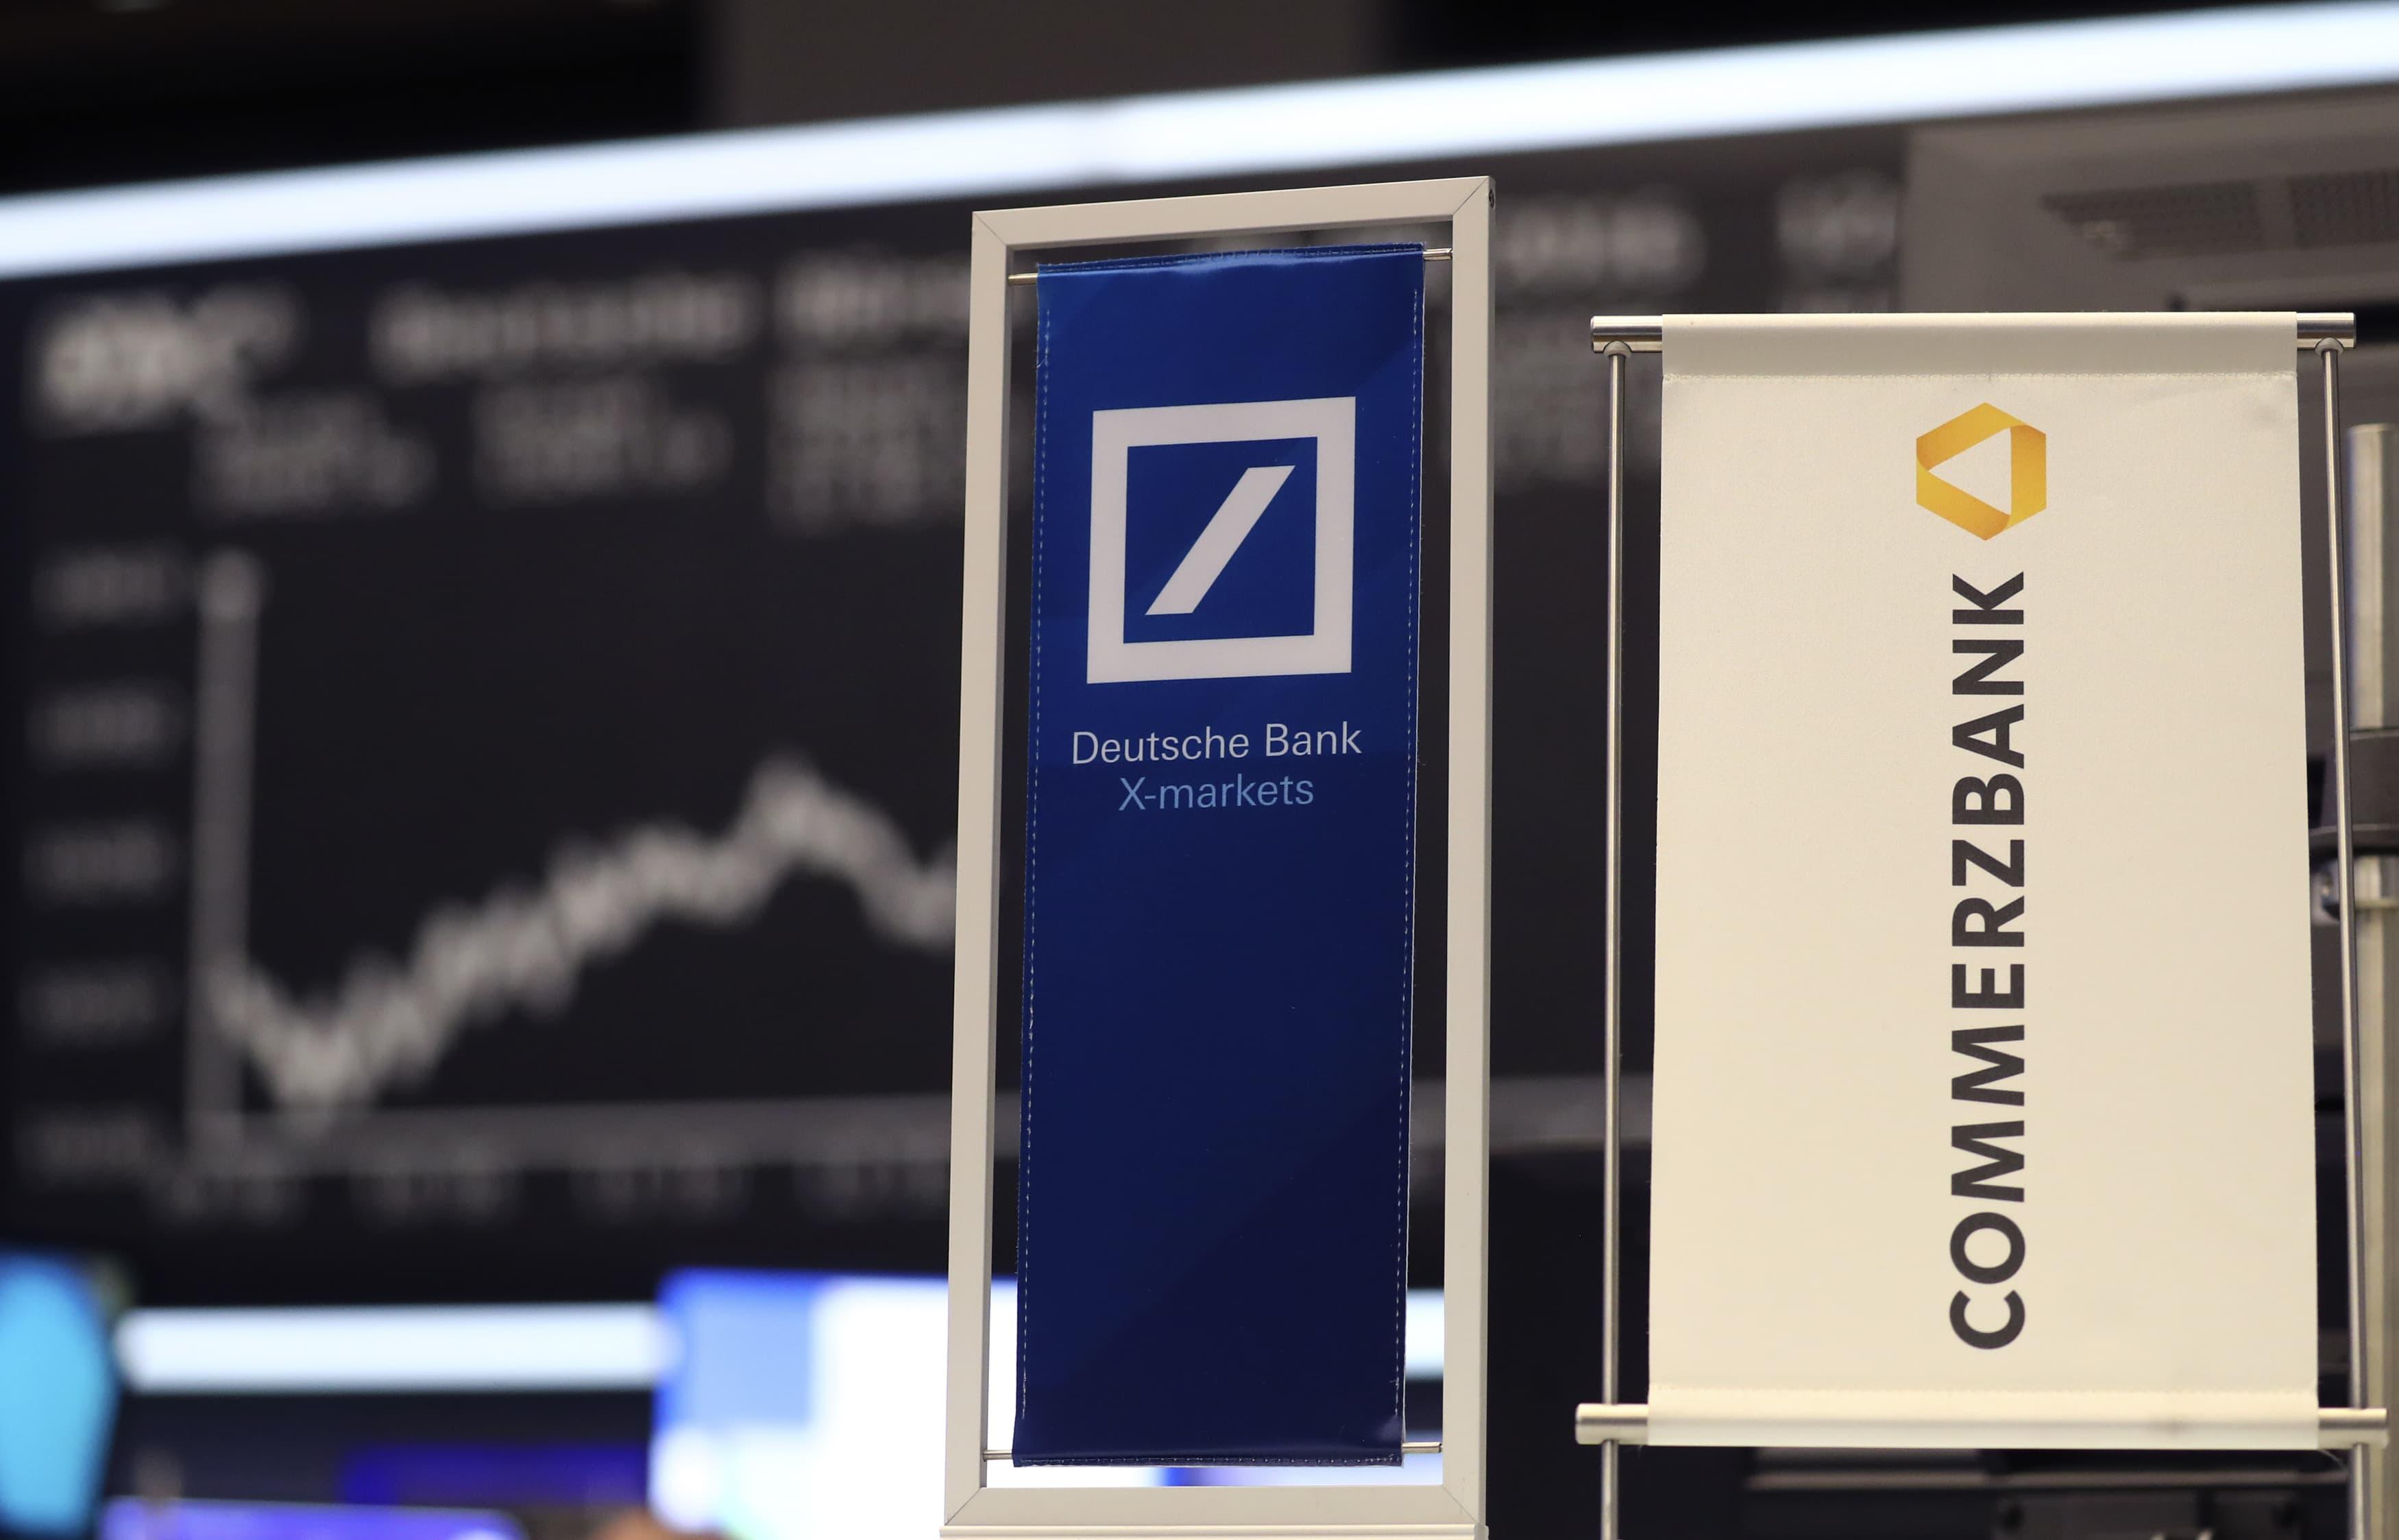 Deutsche Bank reportedly considered restructuring Trump's loans on worries he might default